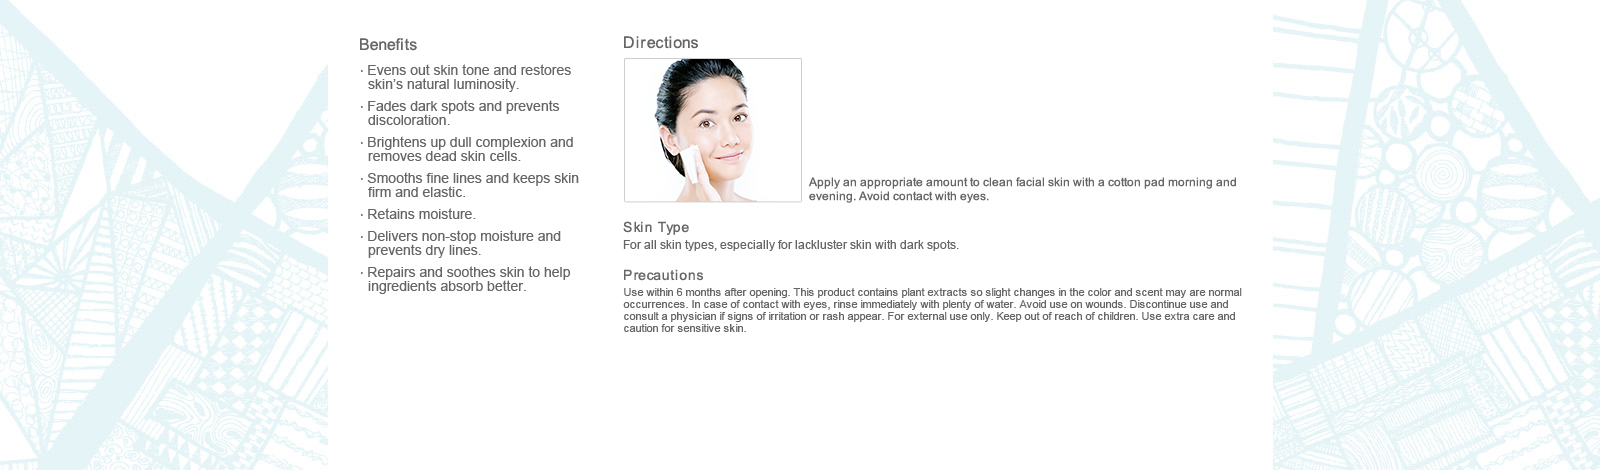 [cml_media_alt id='4499']apple-seed-tranexamic-acid-black-spots-defying-essence-04[/cml_media_alt]